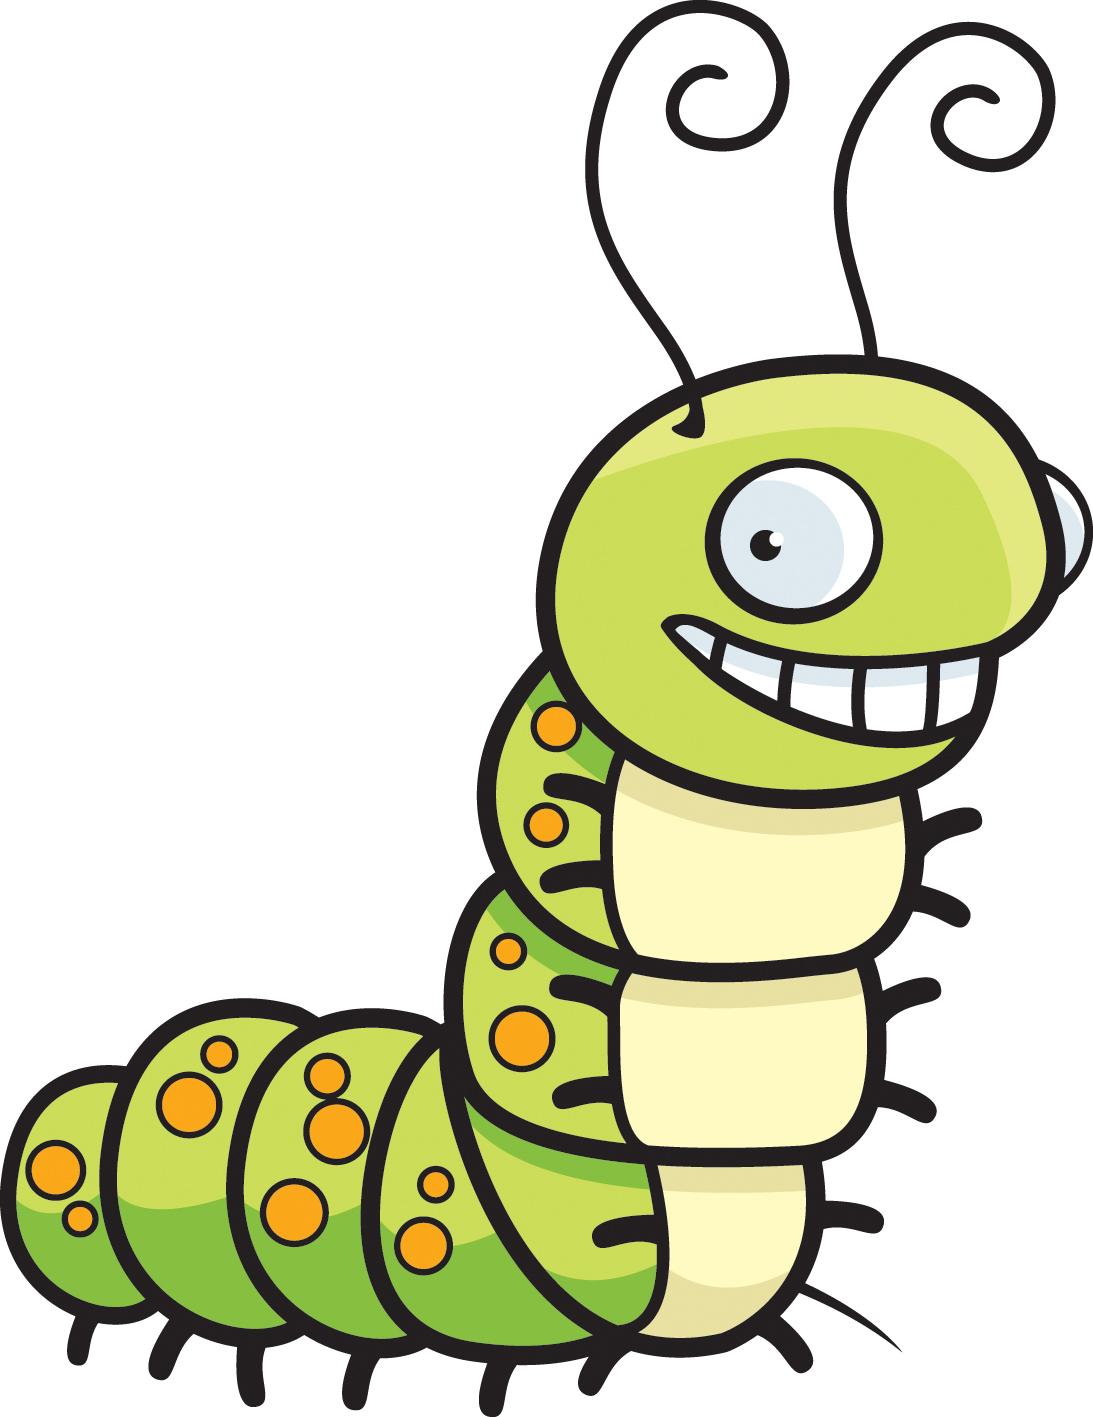 Free Caterpillar Cliparts, Download Free Clip Art, Free Clip.